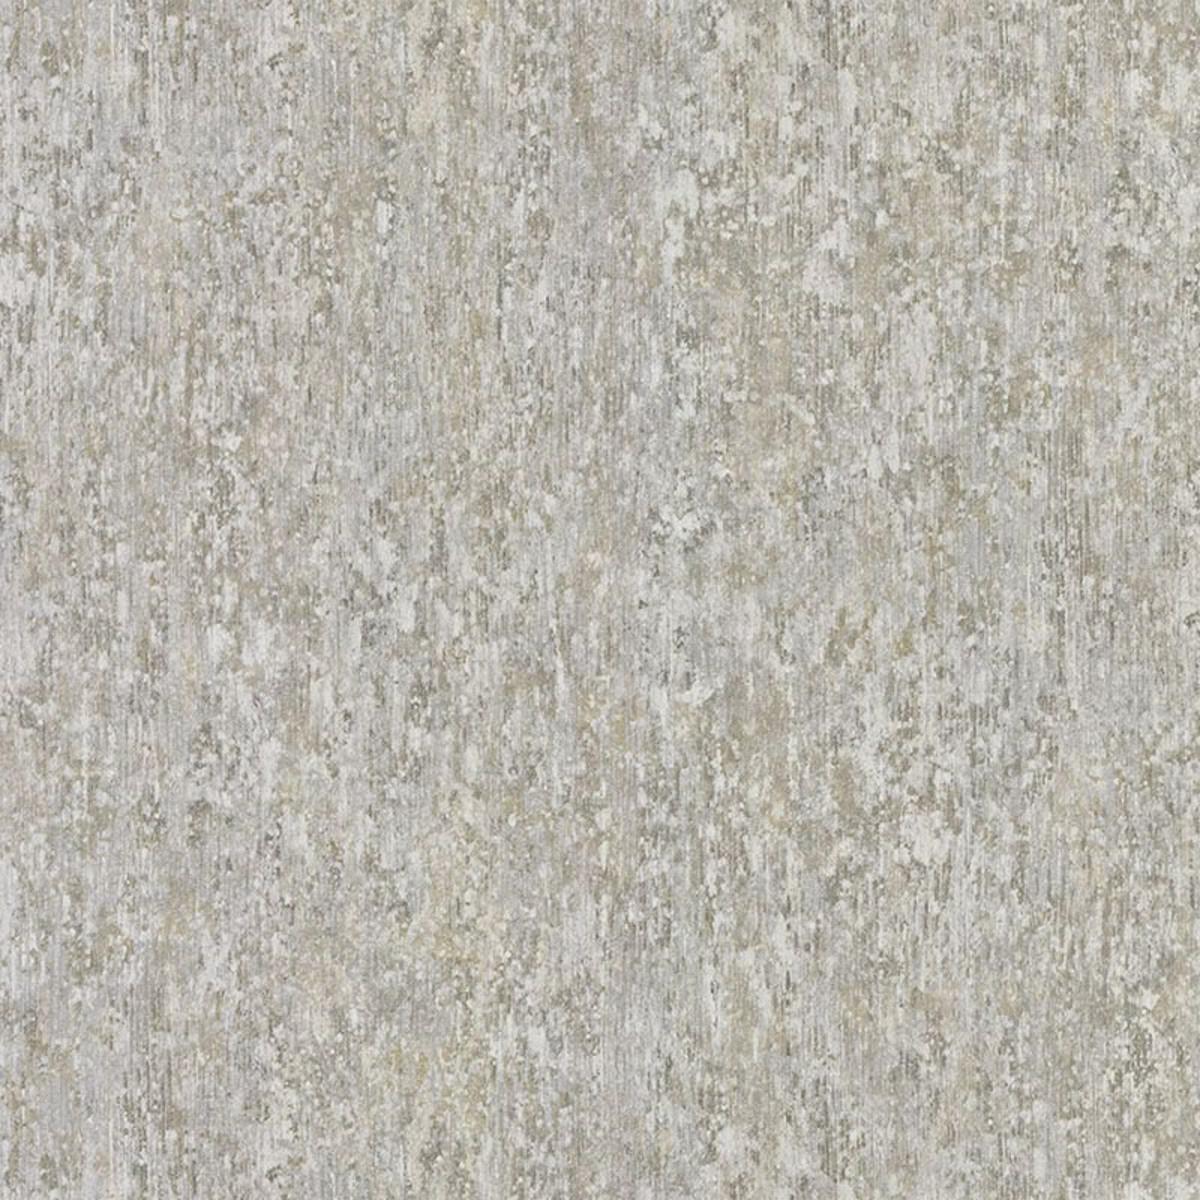 Обои флизелиновые Decori-Decori Altera бежевые 1.06 м 82319